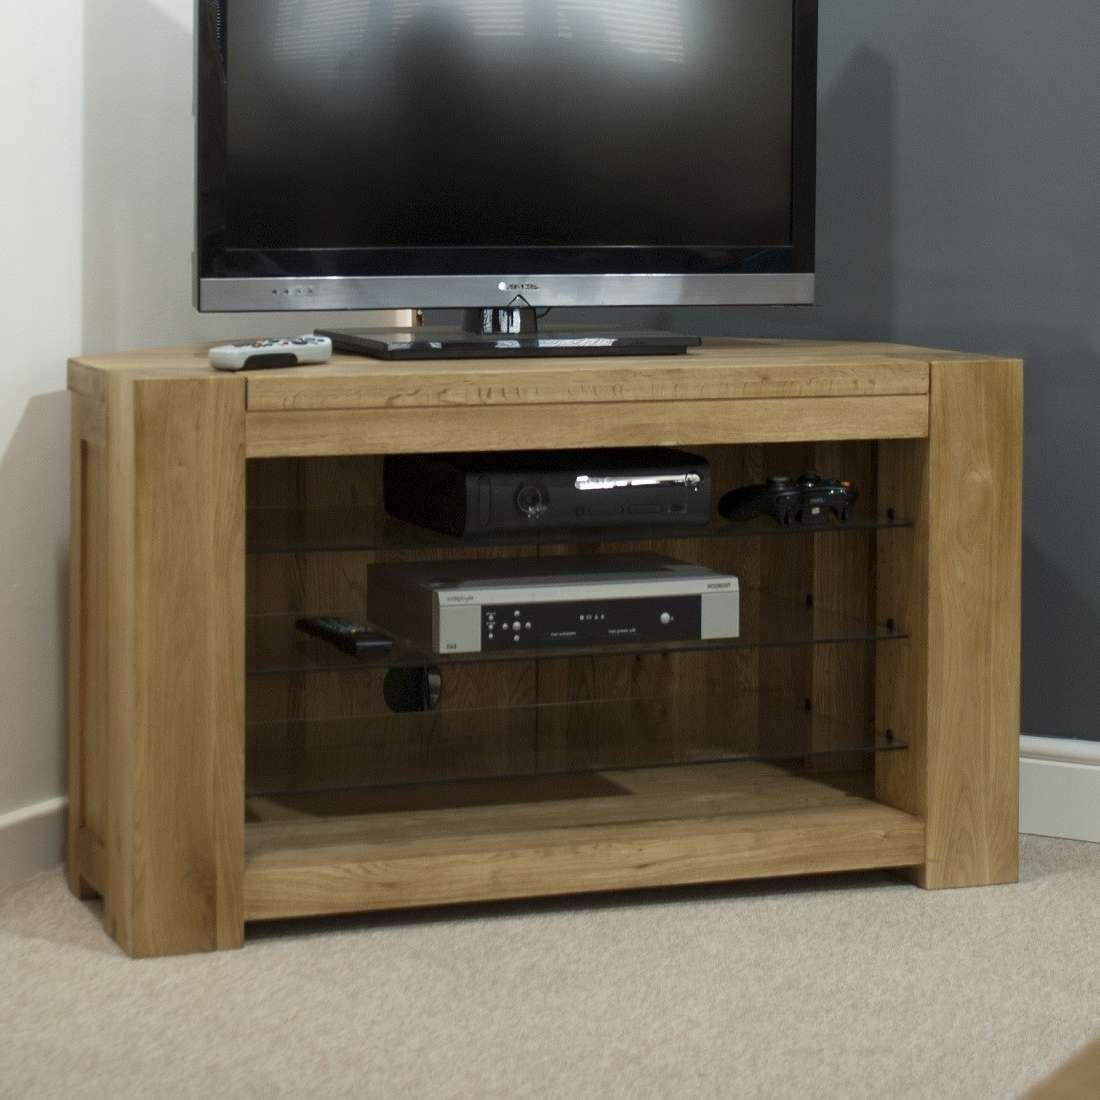 Trend Solid Oak Corner Tv Unit | Oak Furniture Uk Within Solid Wood Corner Tv Cabinets (View 13 of 20)